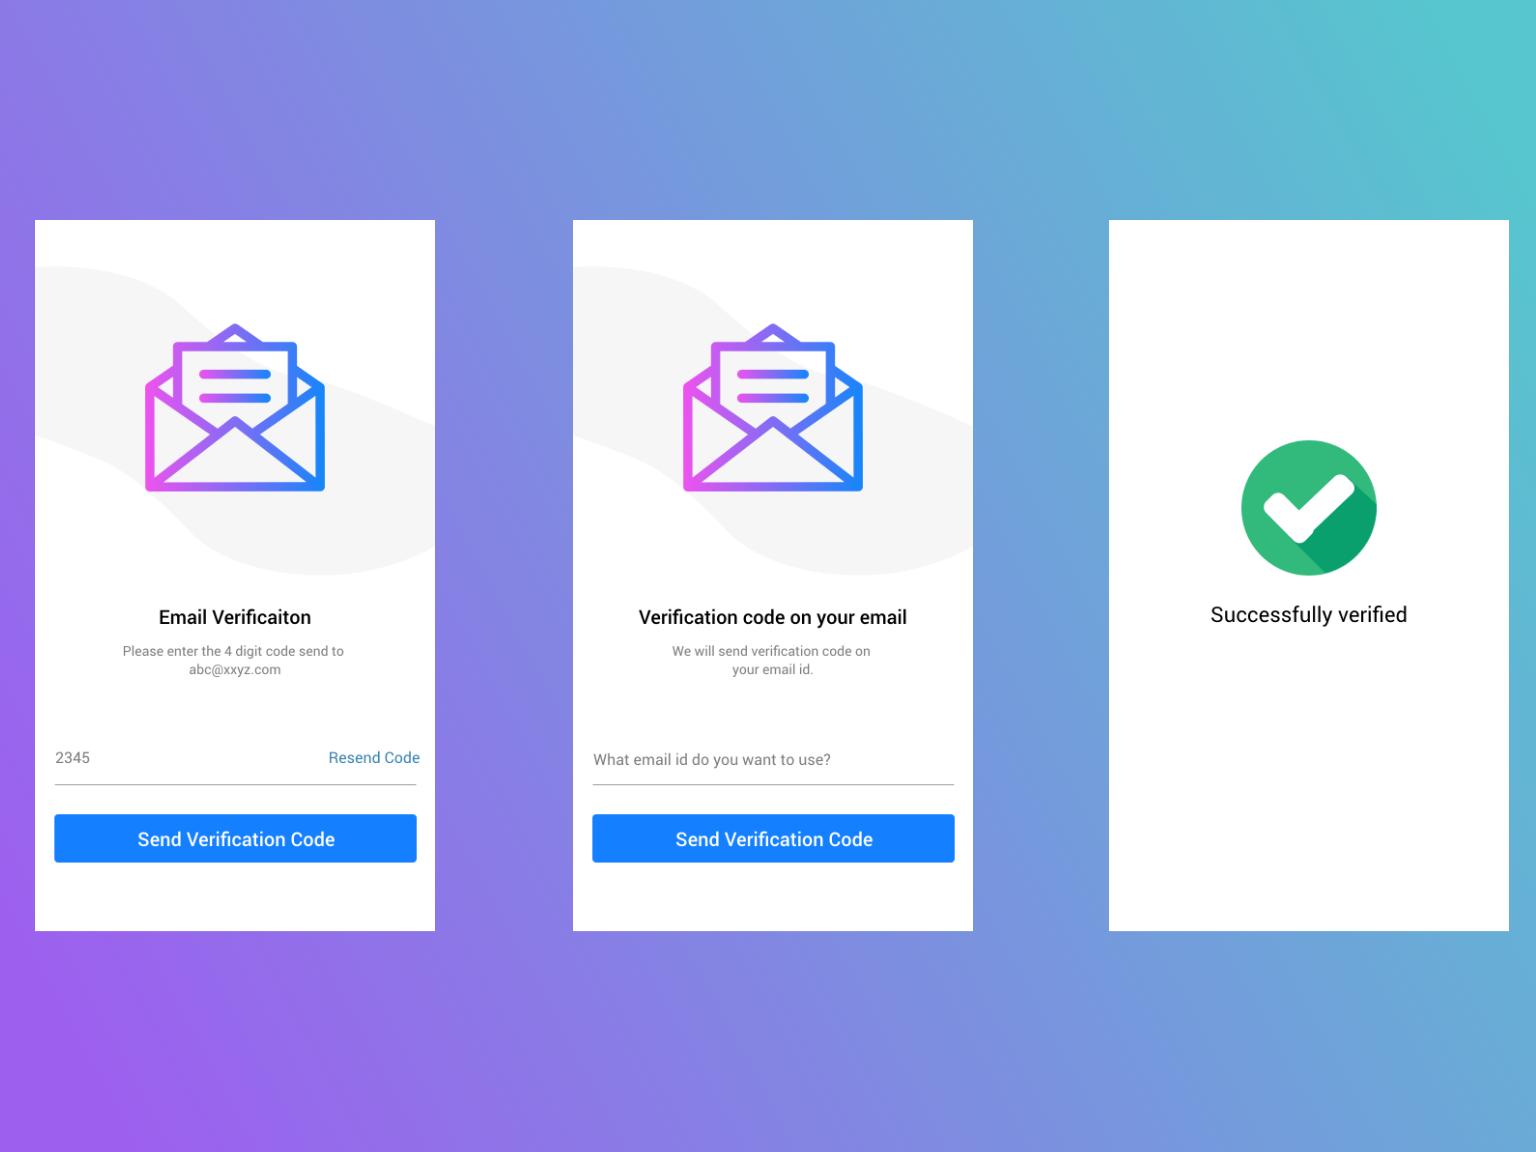 Email verification with success message by Jayakumar Janarthanan